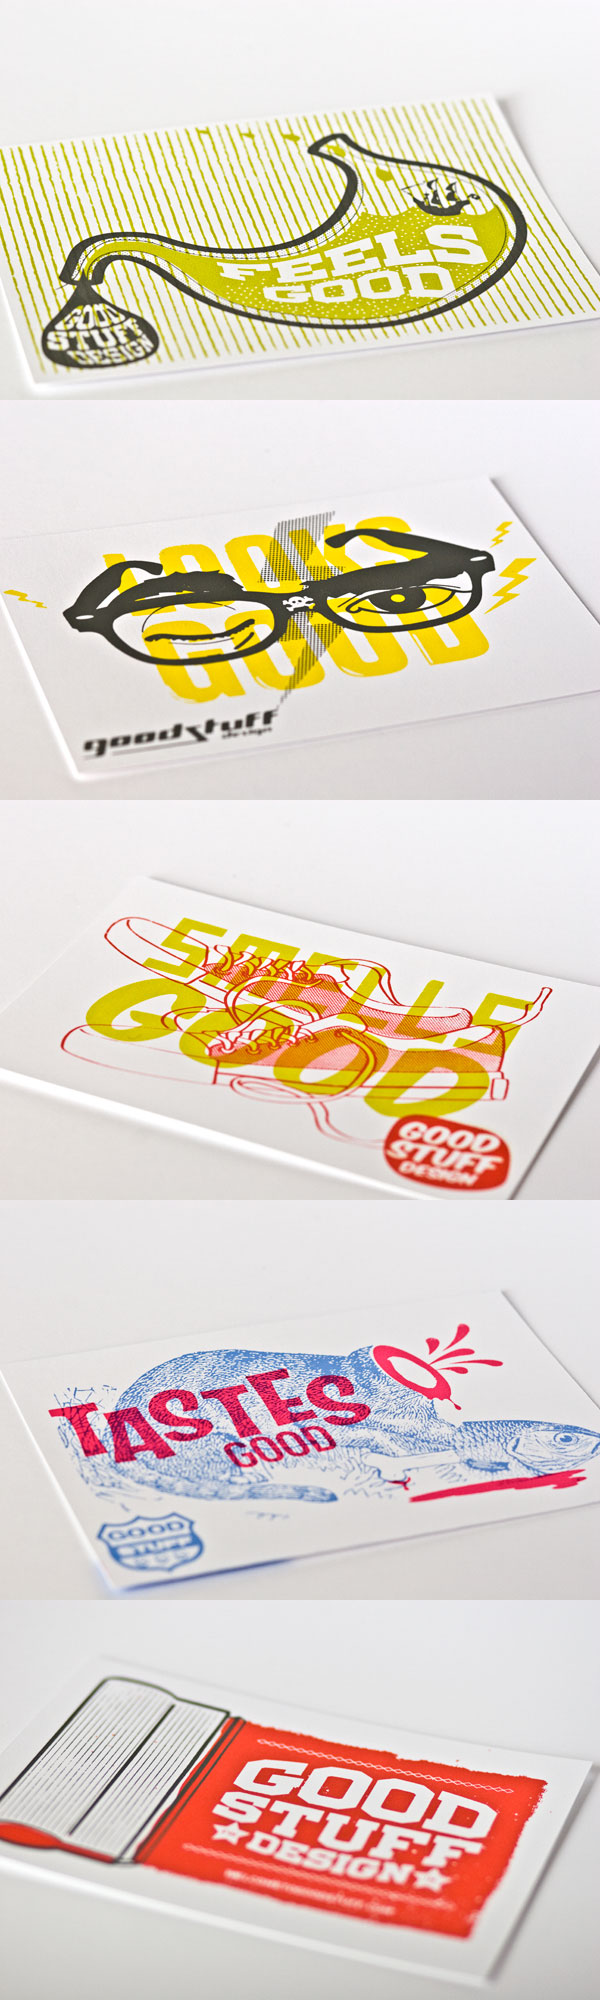 Good Stuff Design Good Cards